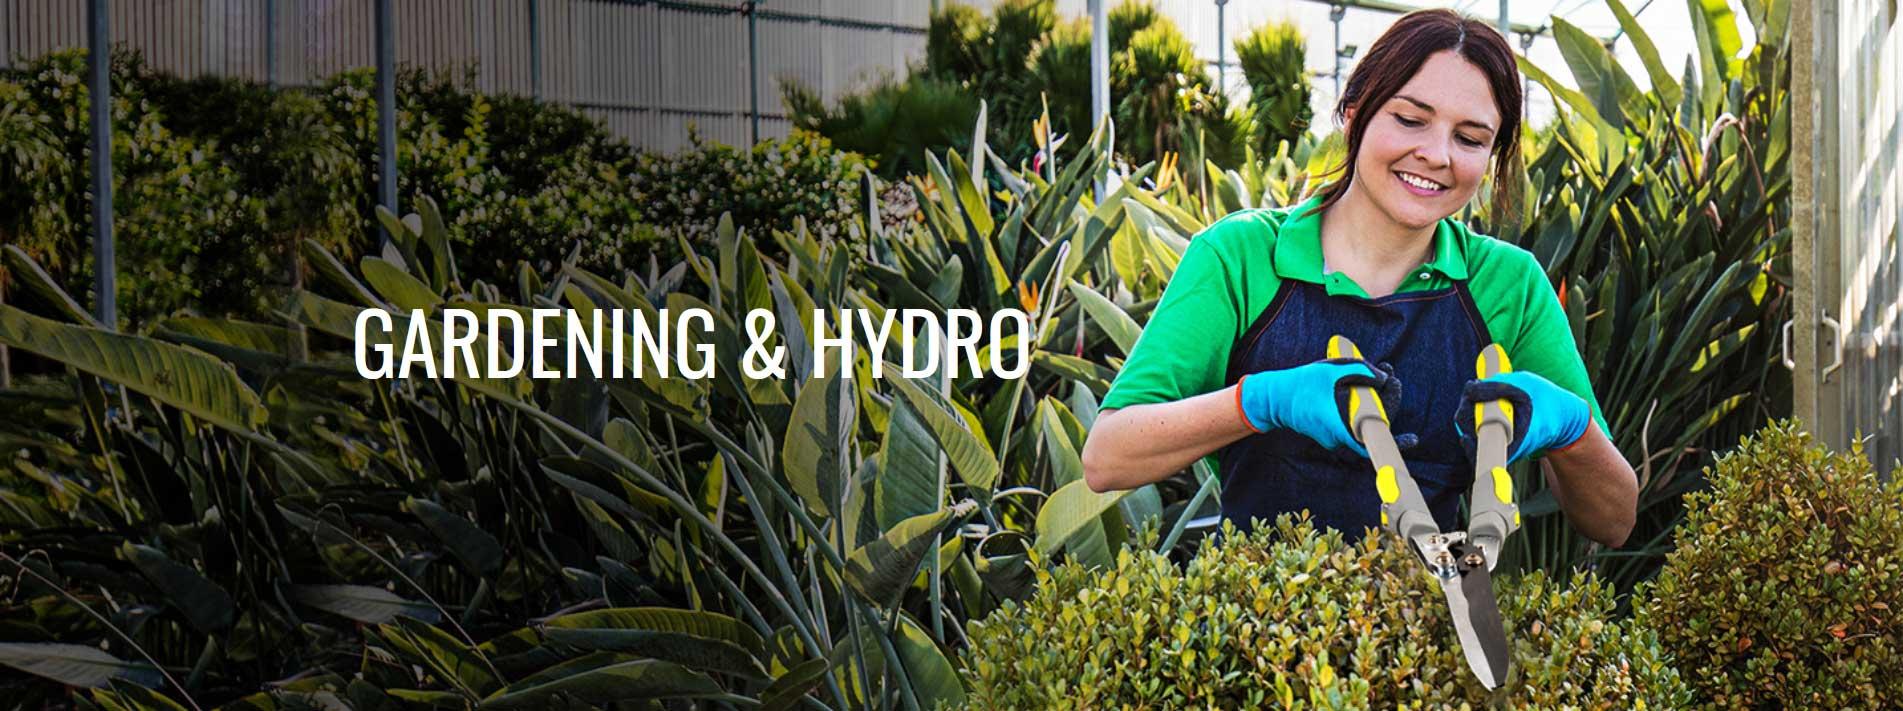 Gardening & Hydro